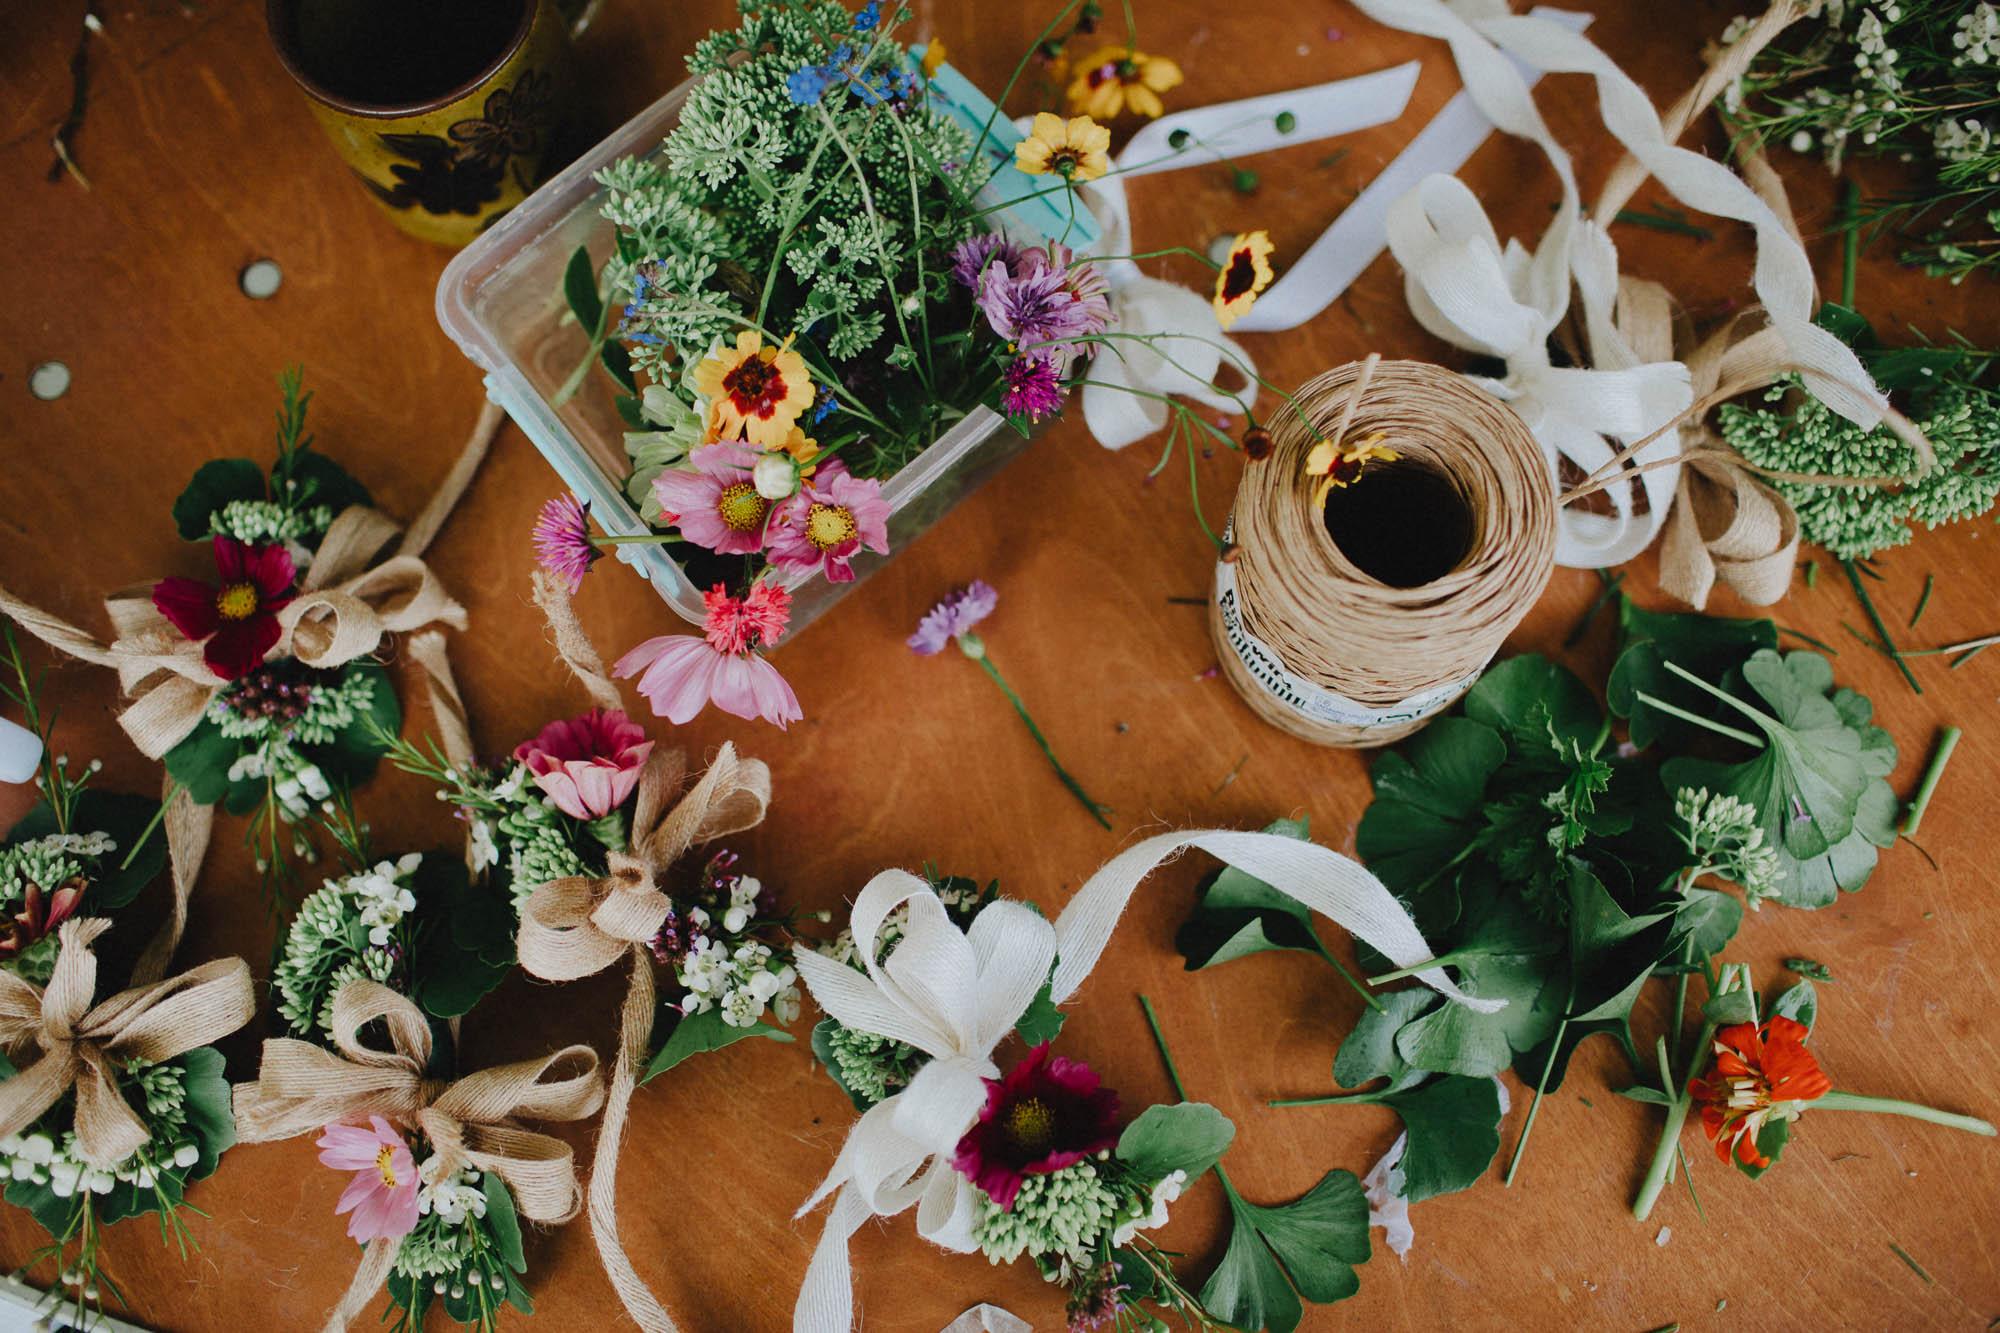 Leah-Graham-Michigan-Outdoor-DIY-Wedding-009@2x.jpg